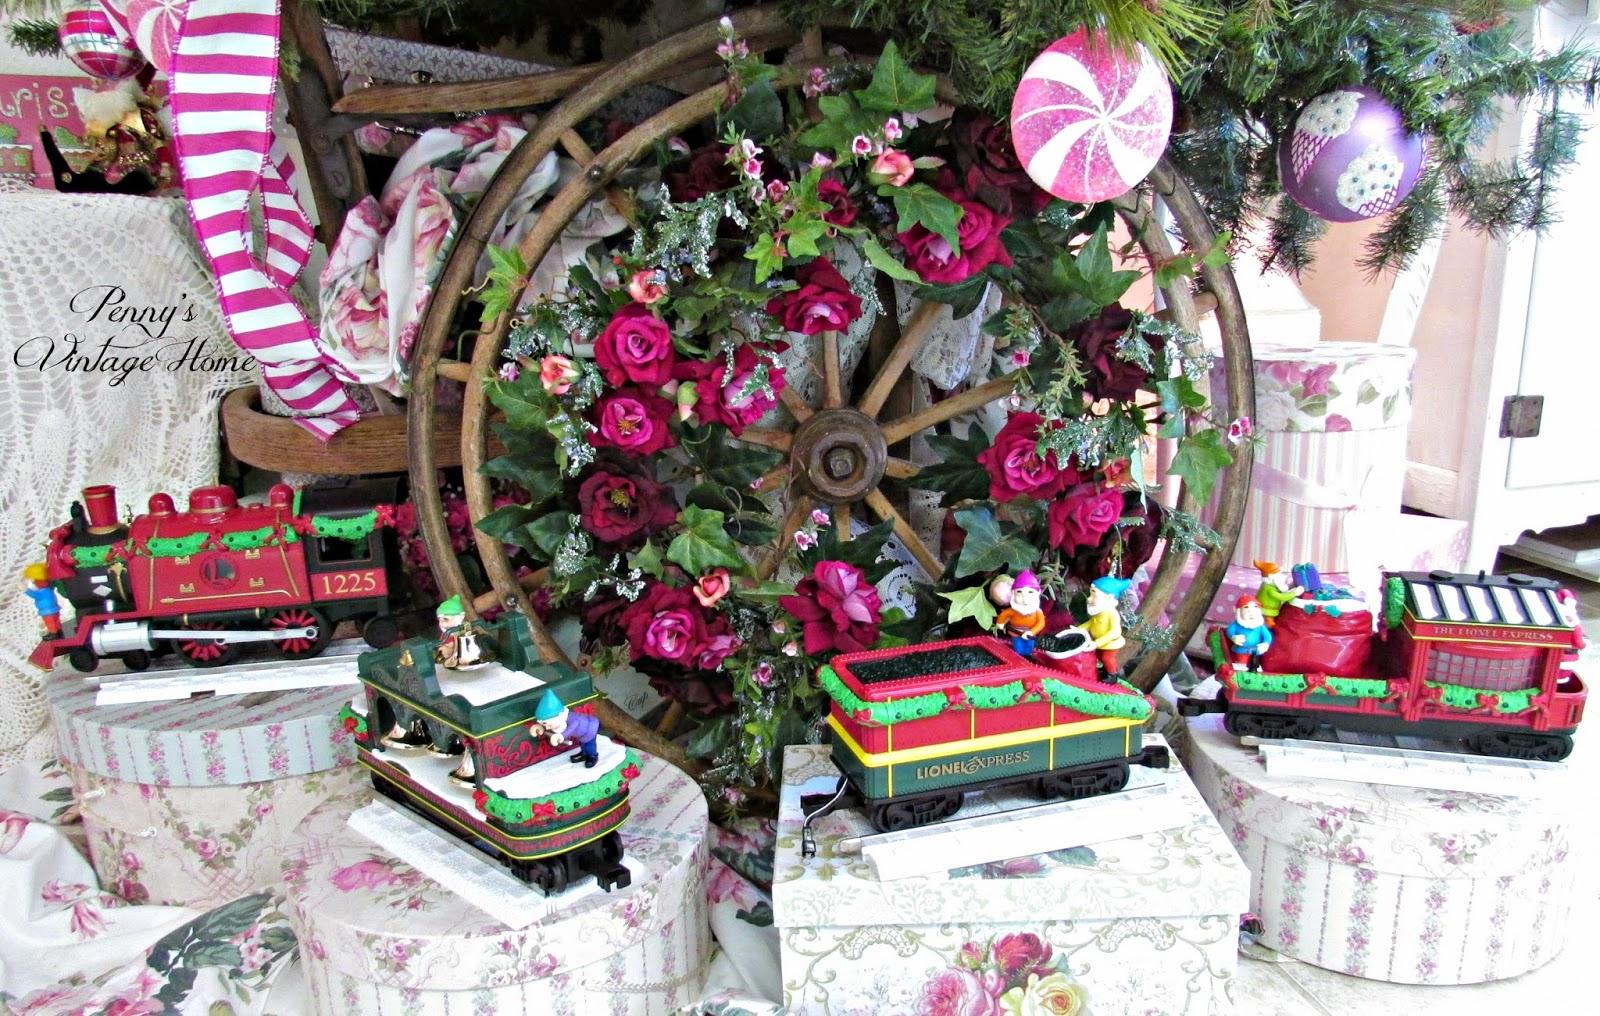 Penny's Vintage Home: Fairy Tale Christmas Tree